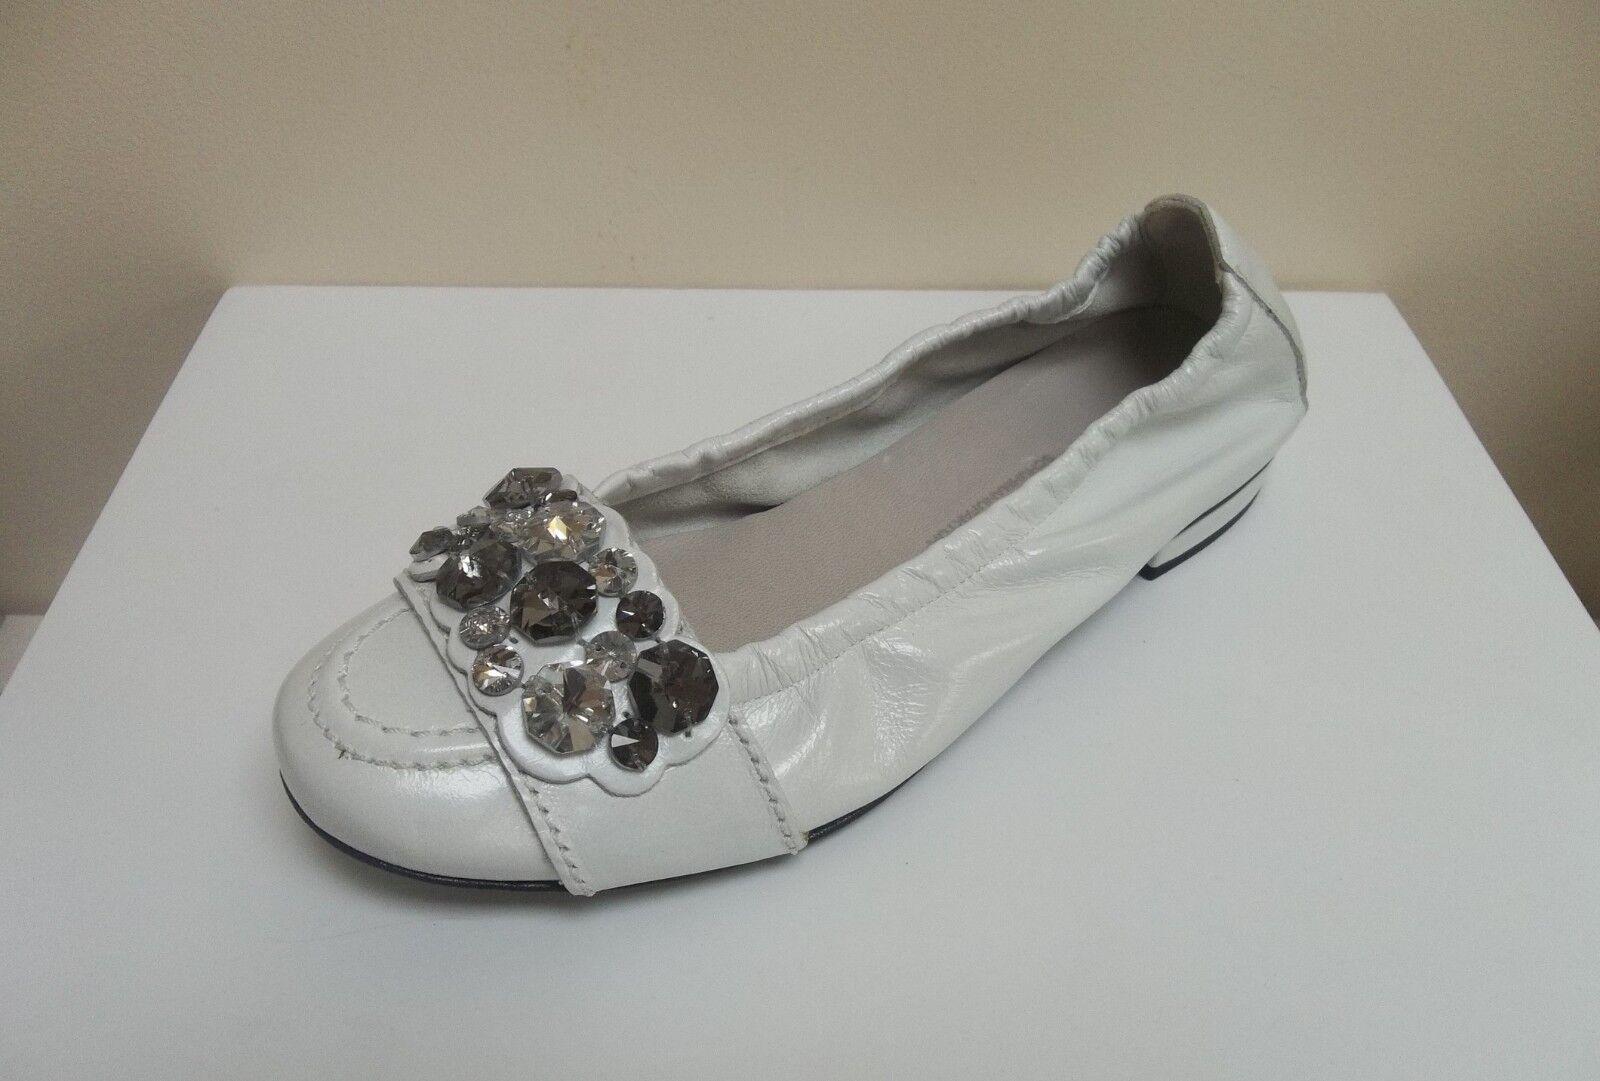 K&S Malu blanc patent crystal embellished flats, UK 3 EU 36,   BNWB